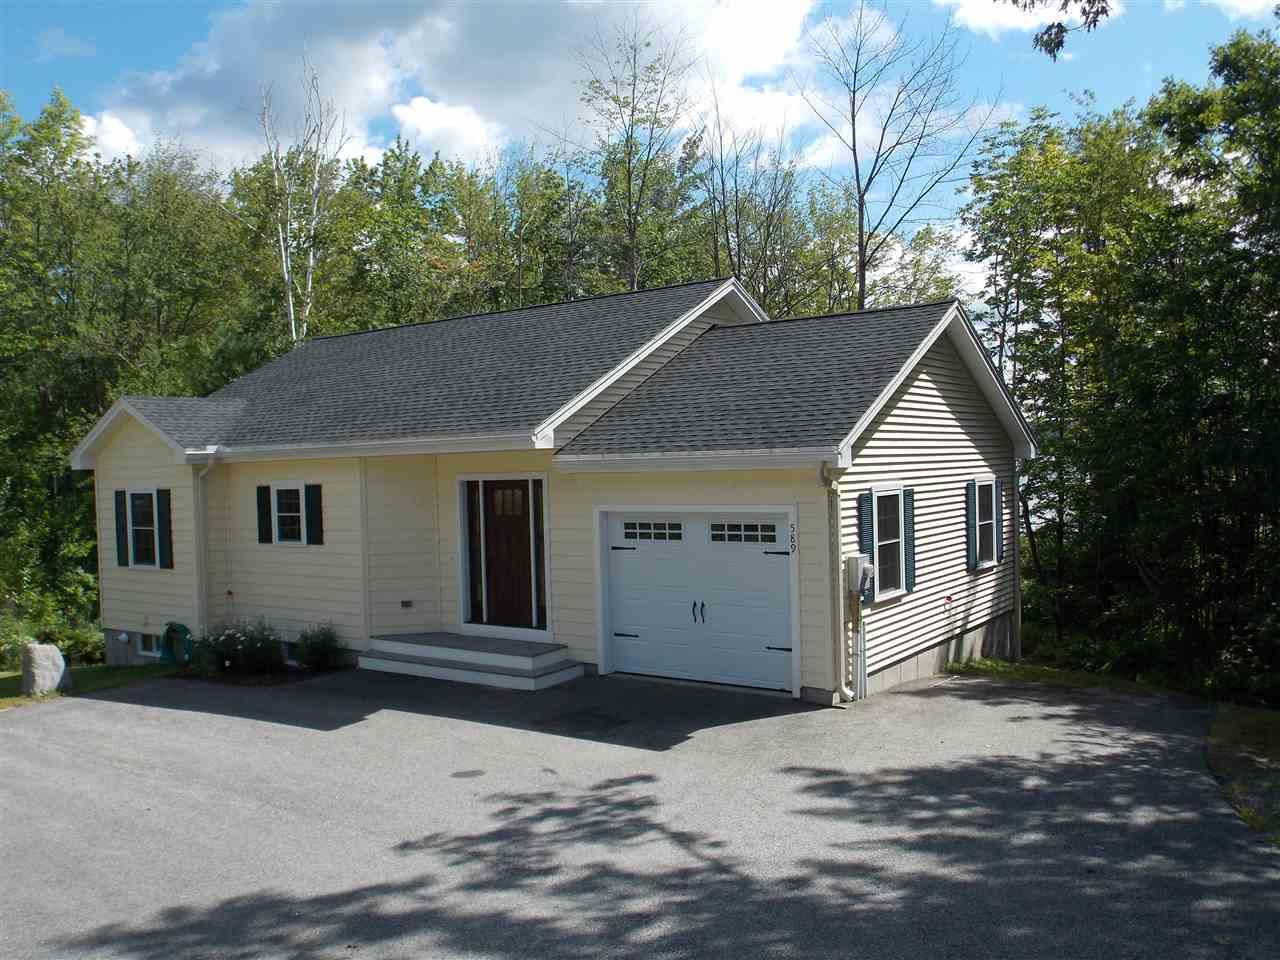 589 Laconia Road, Tilton, NH | MLS# 4646334 | Verani Realty Tilton Nh Homes For Sale Photos